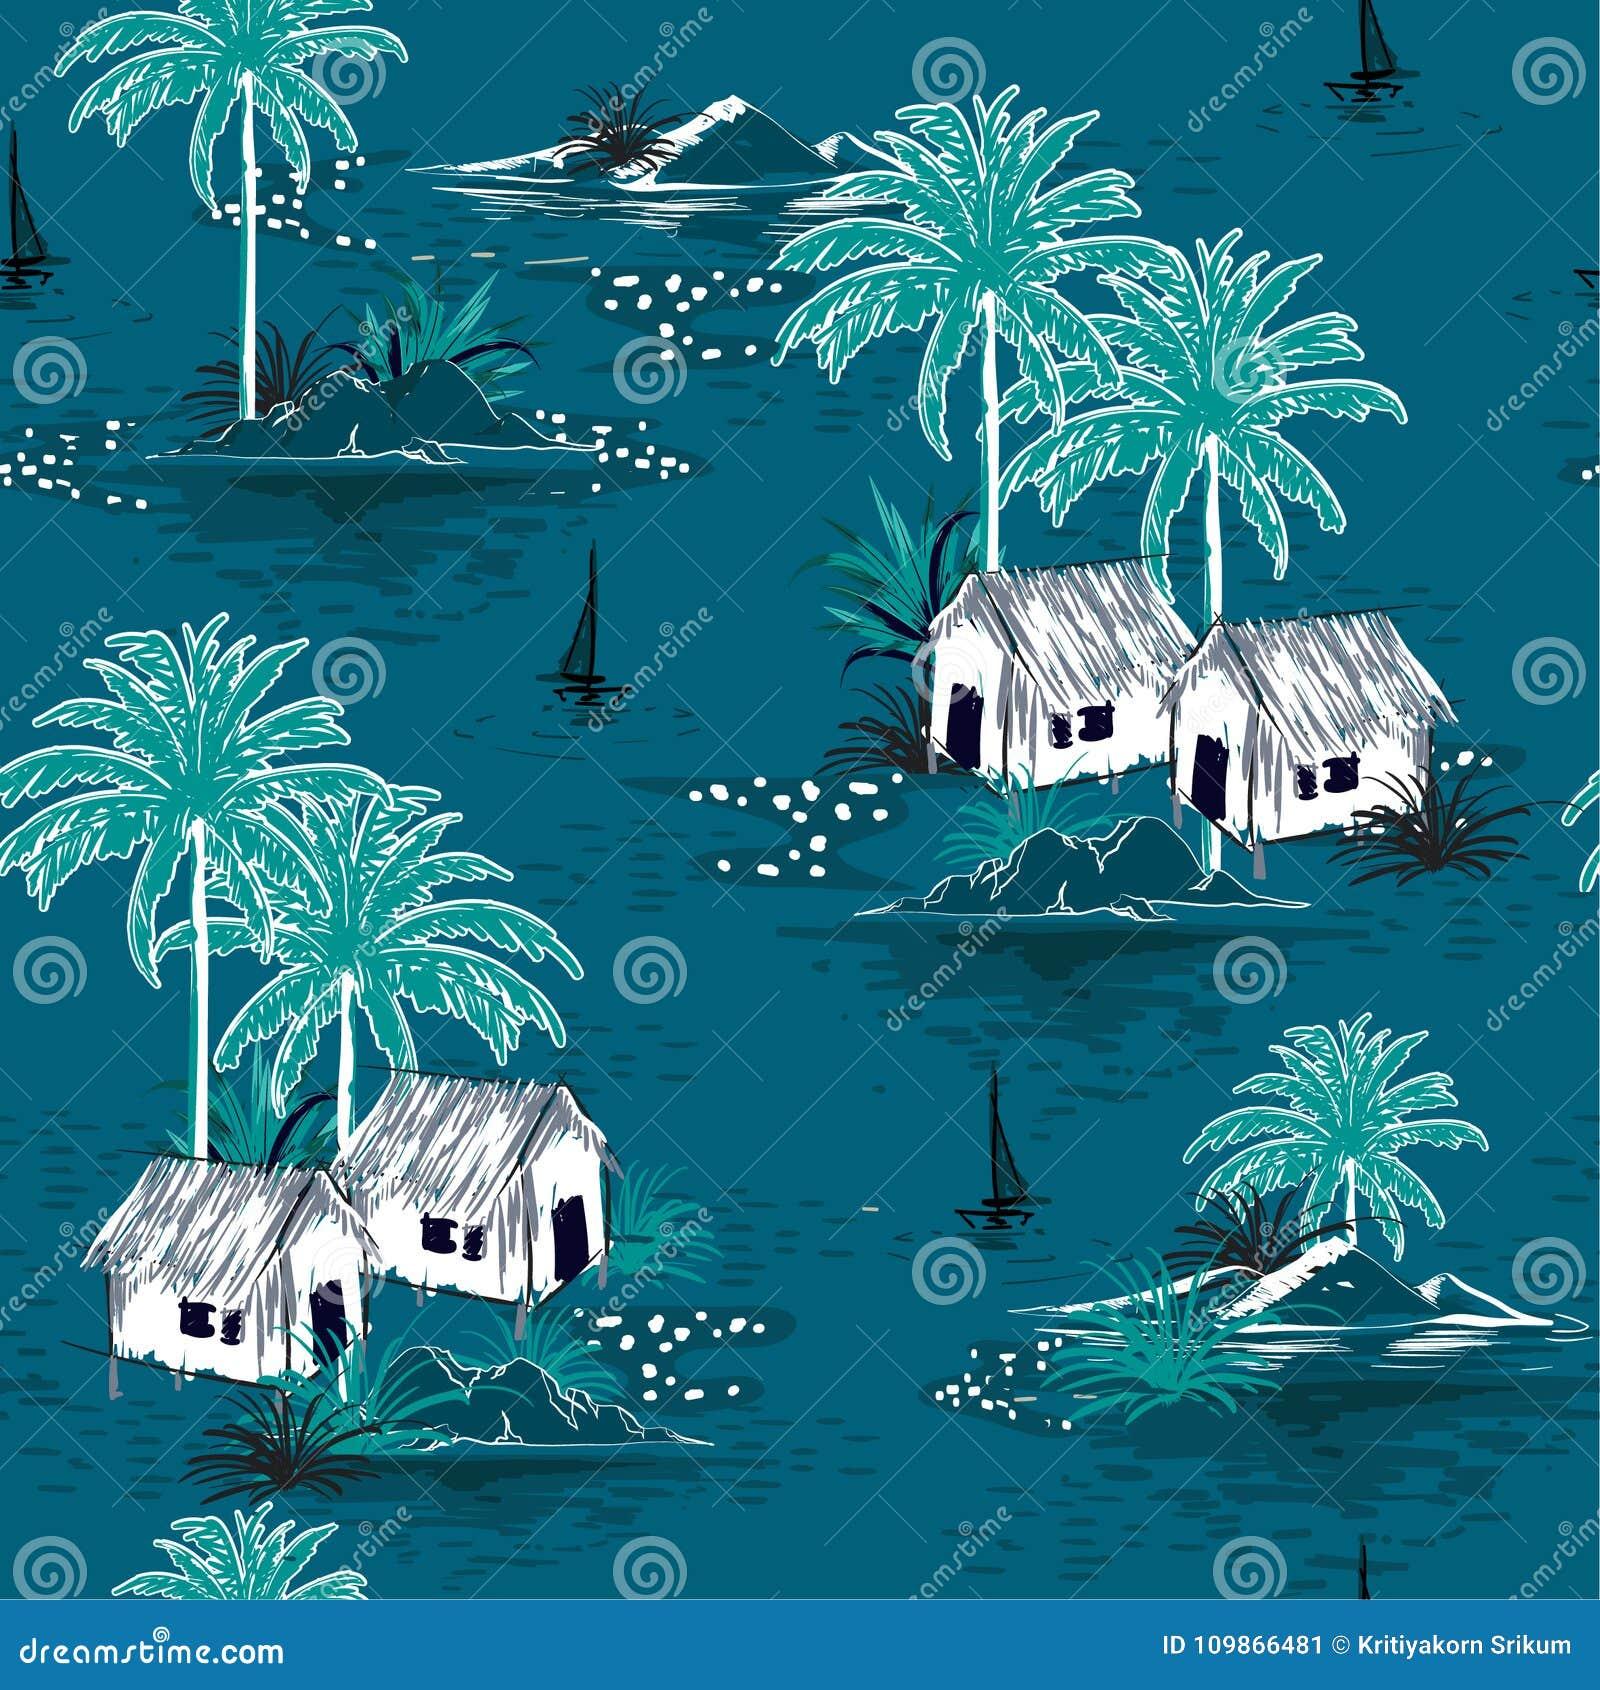 Summer stylish seamless Dark ocean island pattern on blue background. Landscape with palm trees,beach